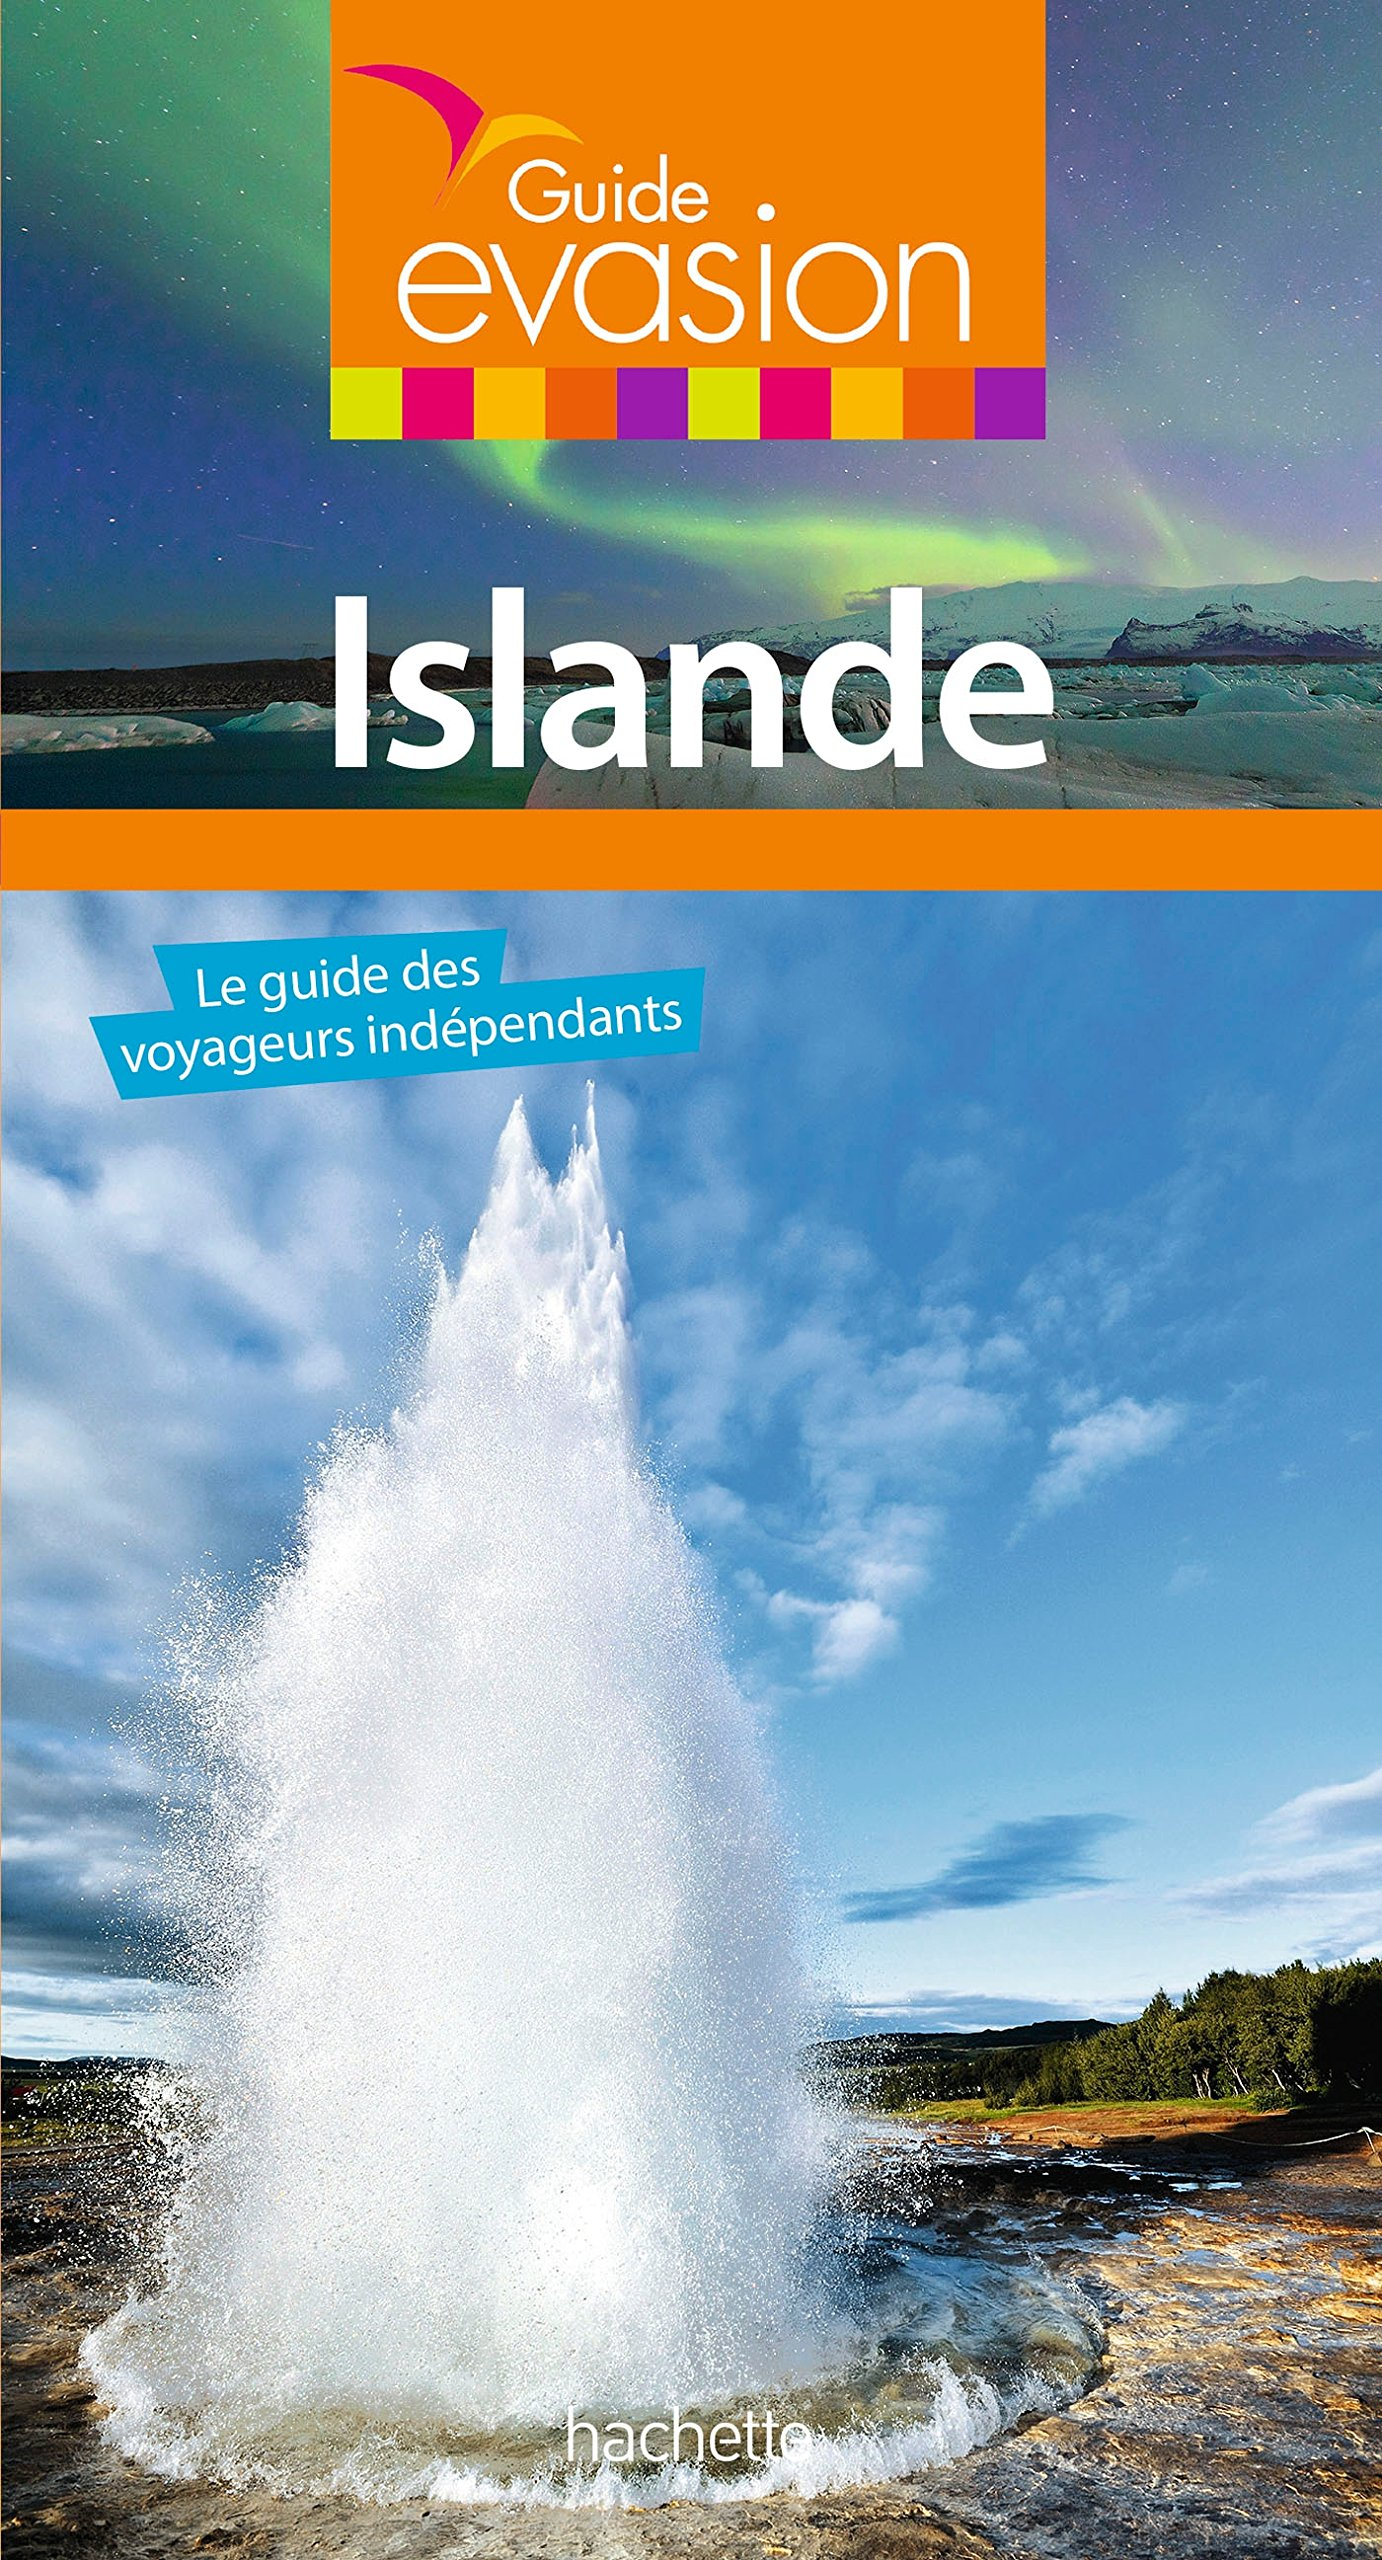 Guide Evasion Islande Broché – 24 mai 2017 Collectif Hachette Tourisme 2013960832 TRAVEL / General